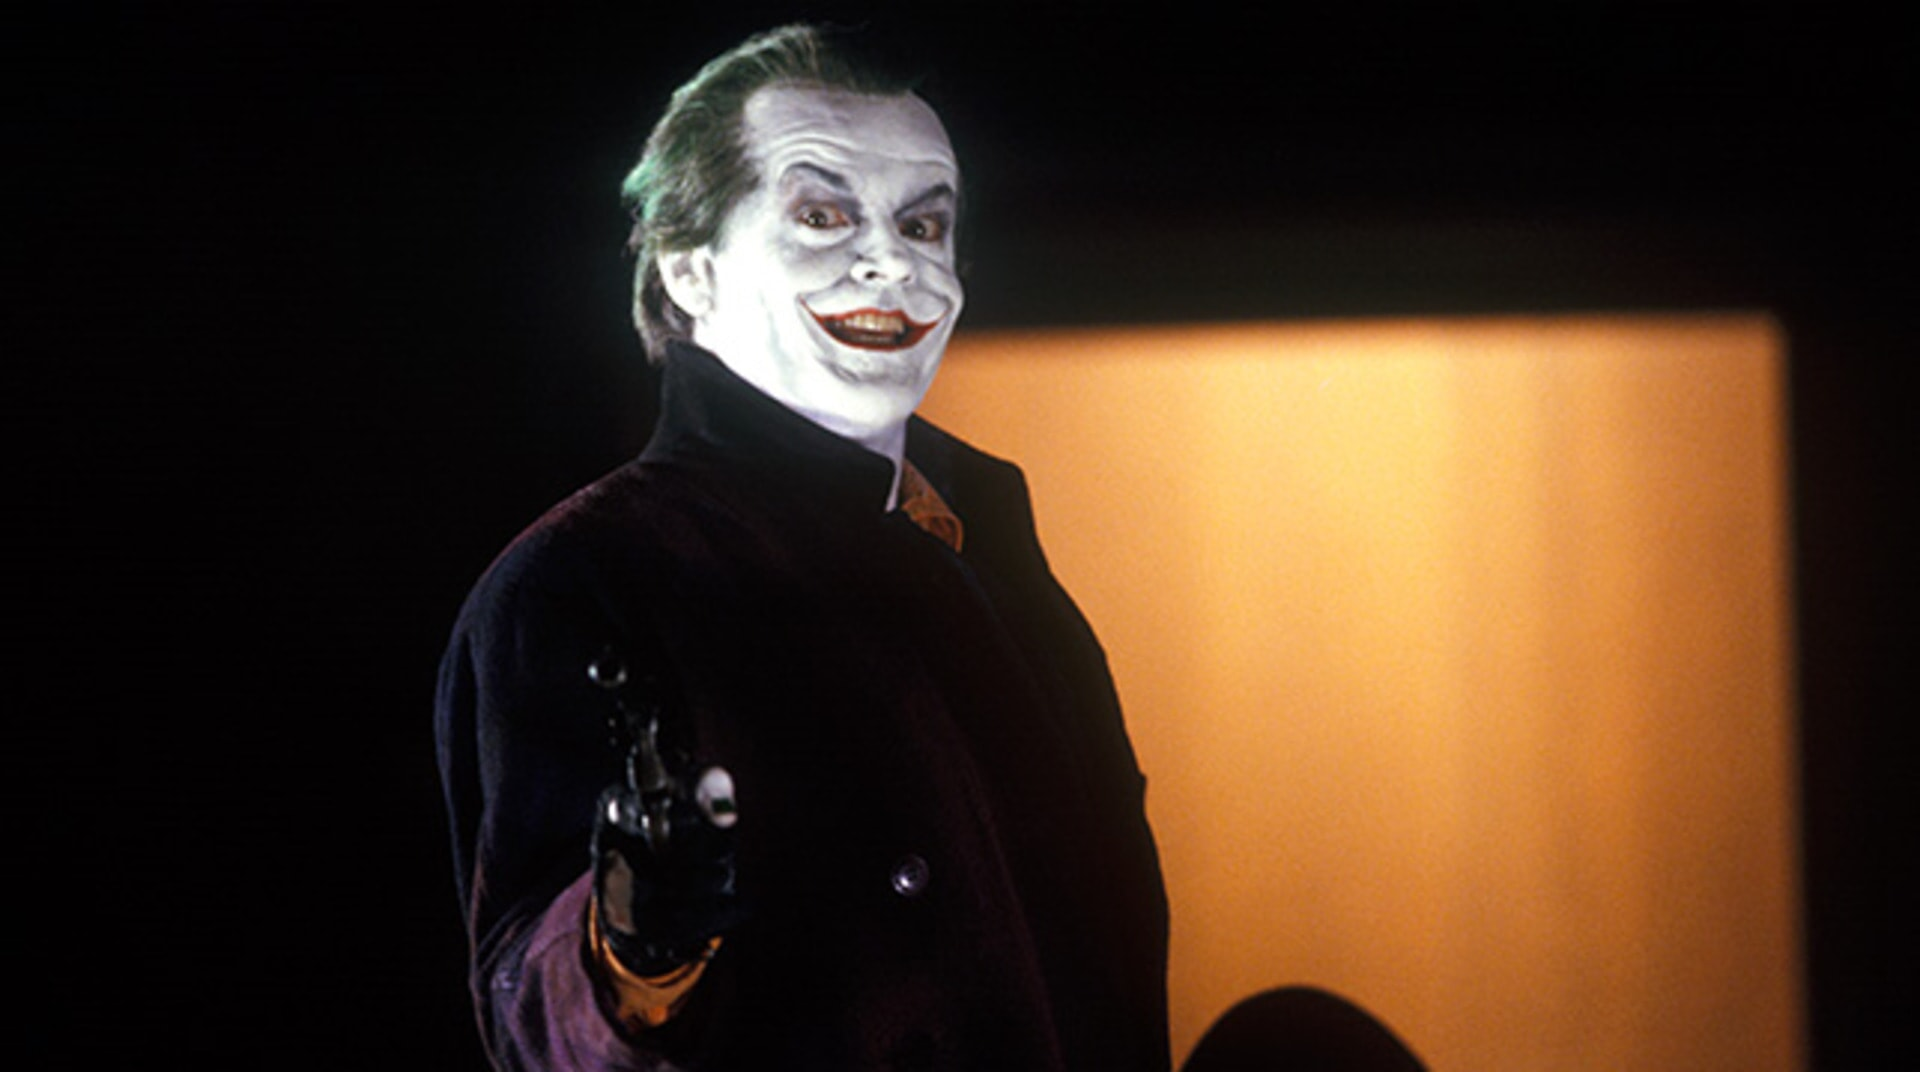 Batman - Image 2